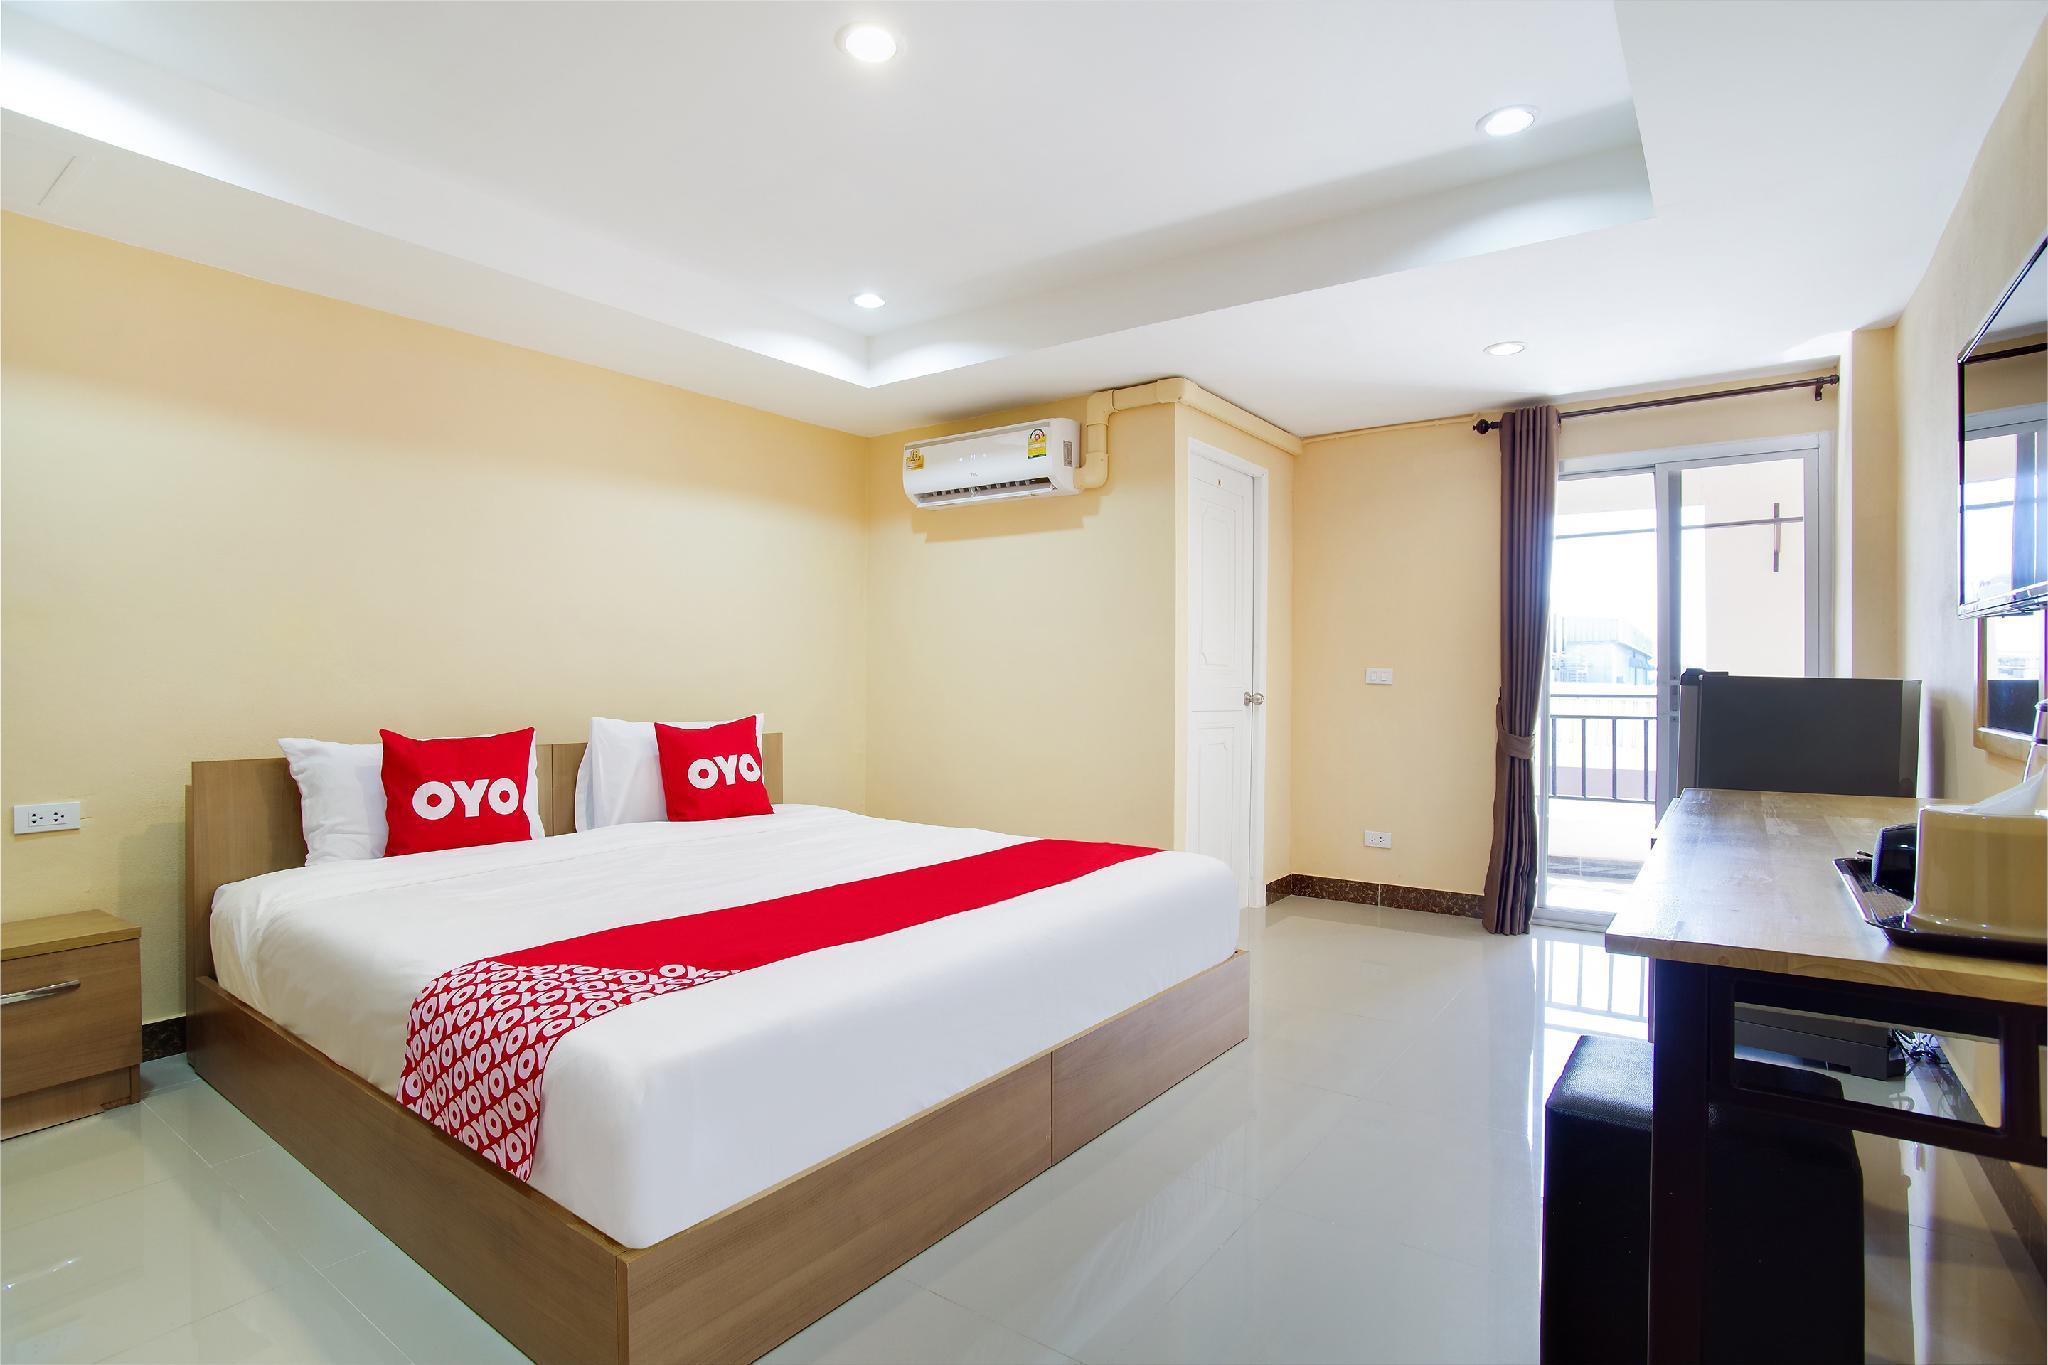 OYO 396 Wises Hotel